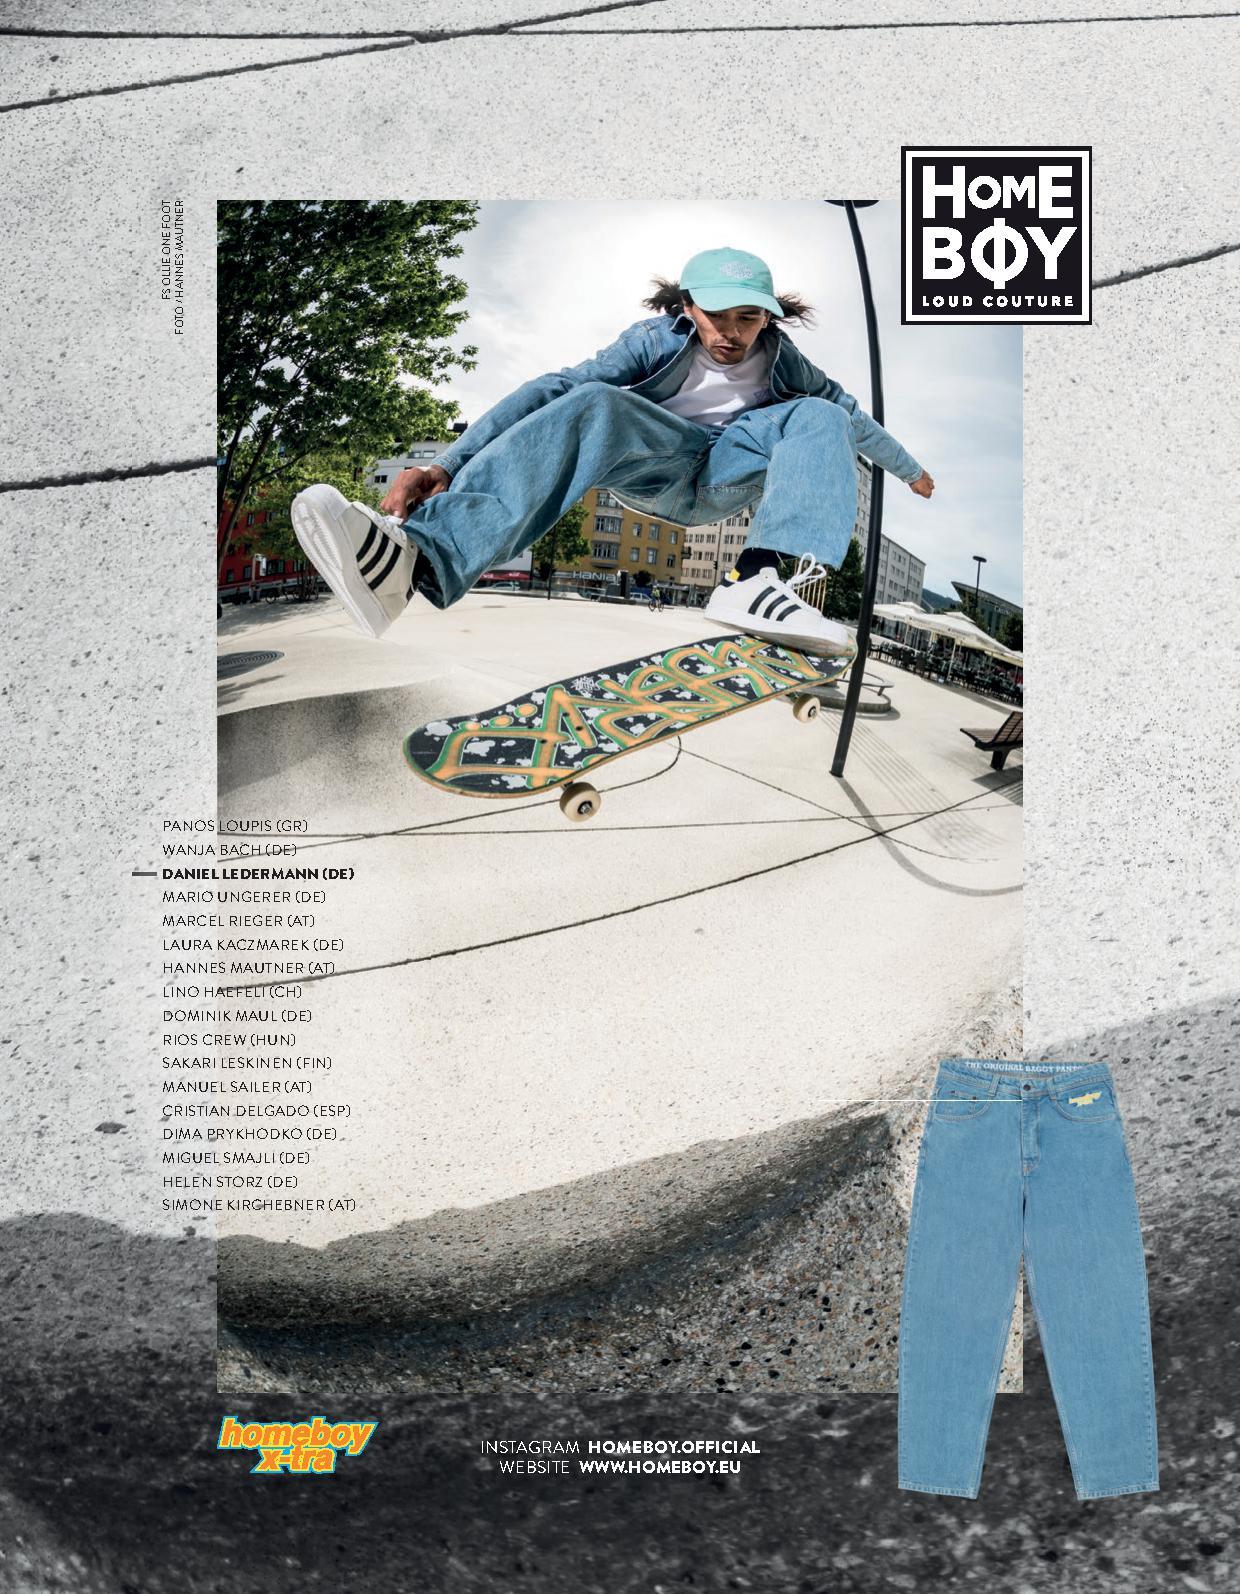 104 Homeboy mens streetwear and womens streetwear